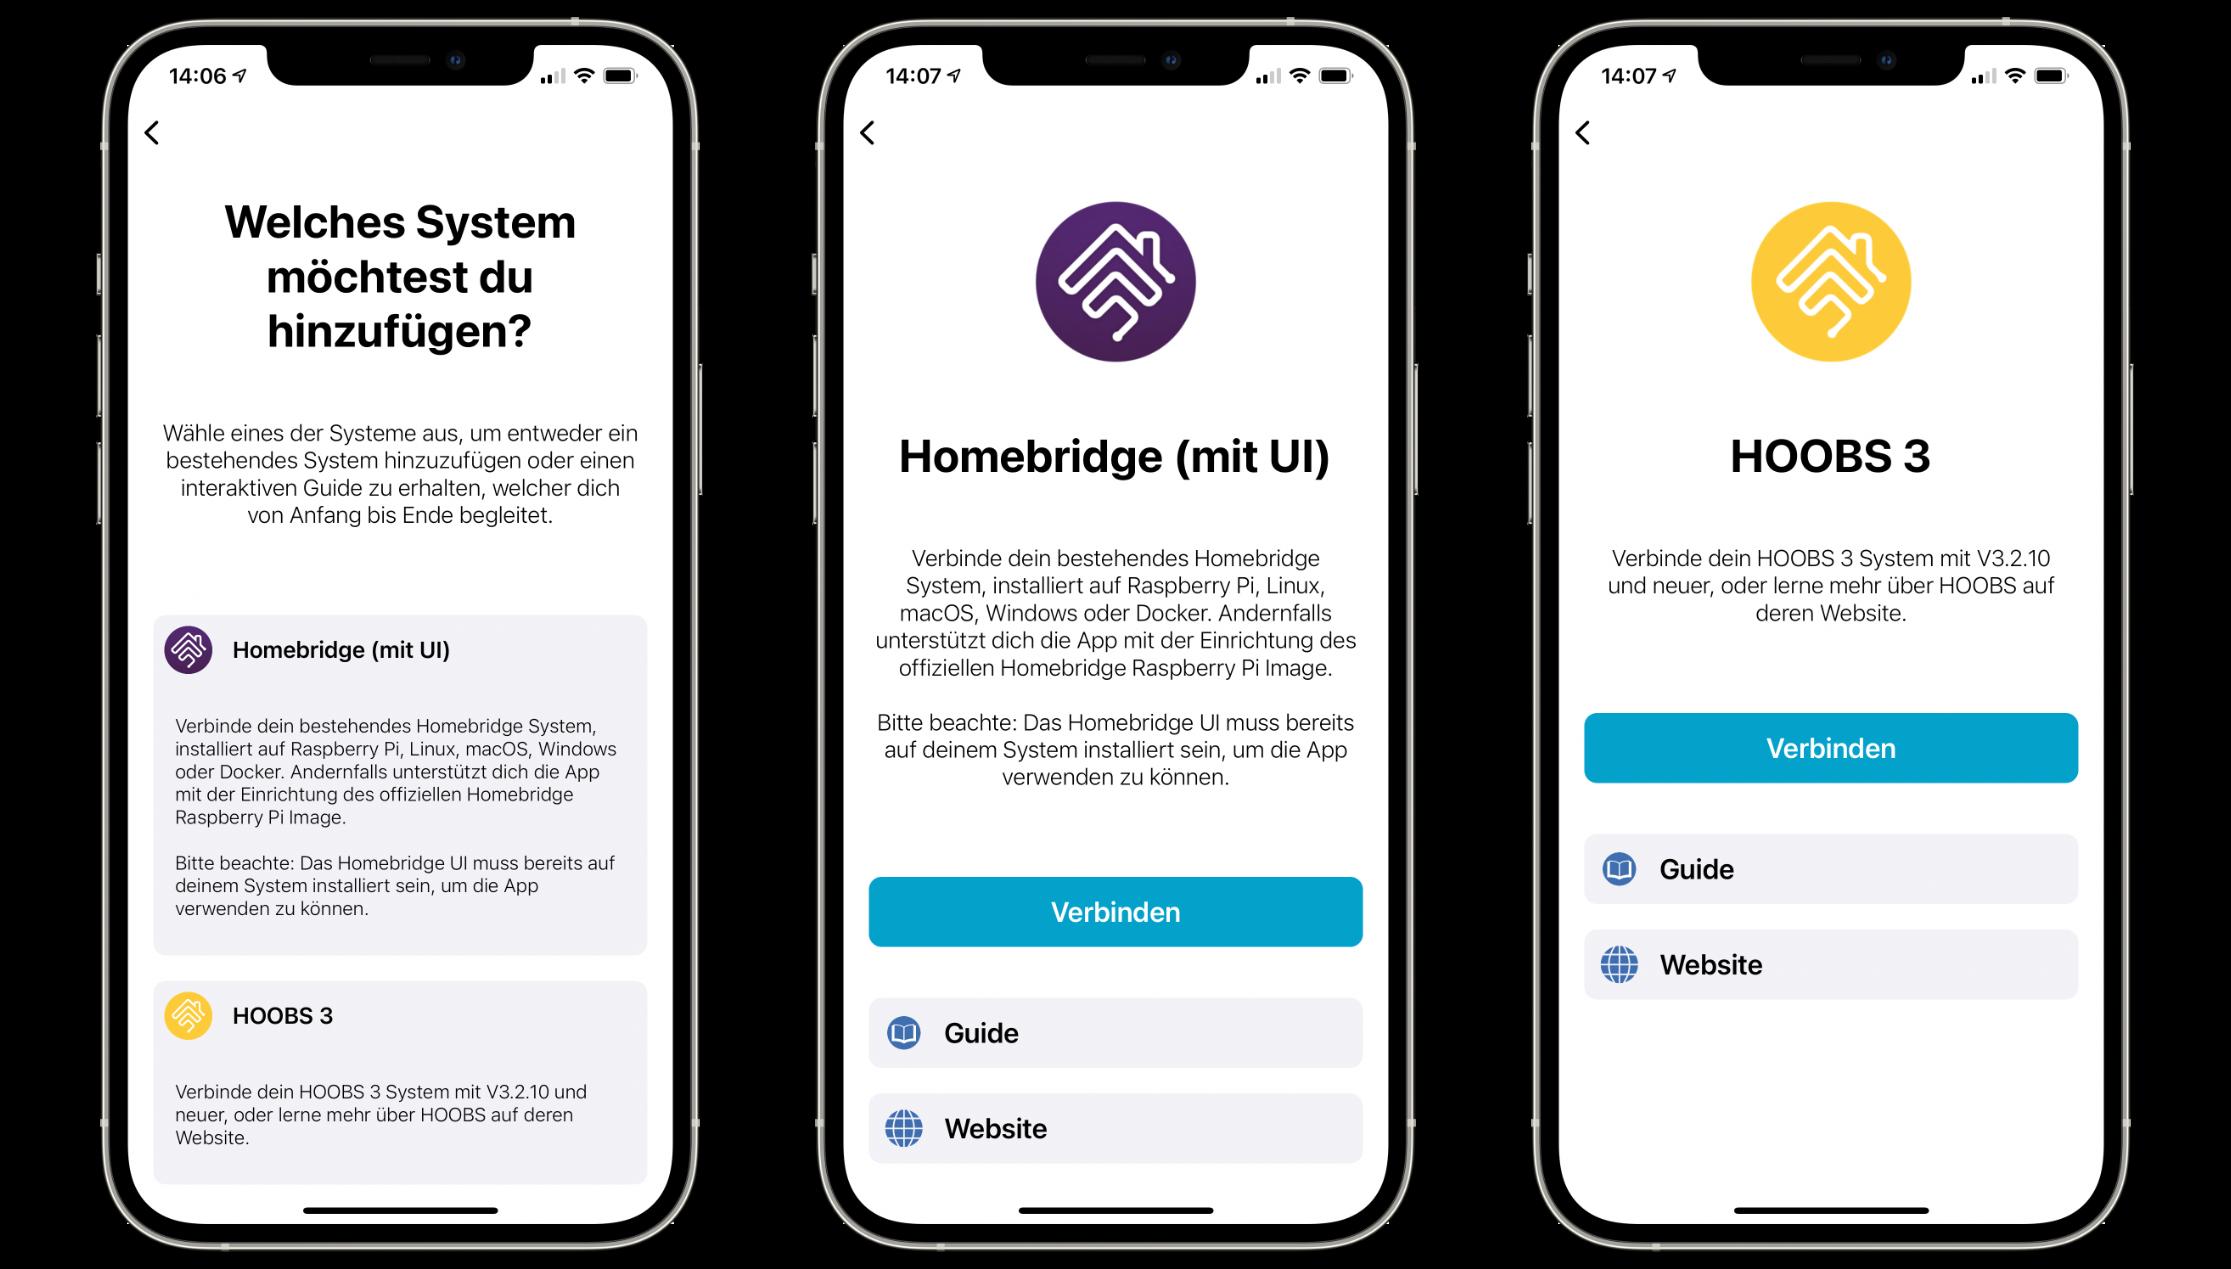 Homemanager-3.0-Homebridge-fuer-Apple-HomeKit-einfach-und-verstaendlich3 Homemanager 3 - Homebridge für Apple HomeKit einfach und verständlich